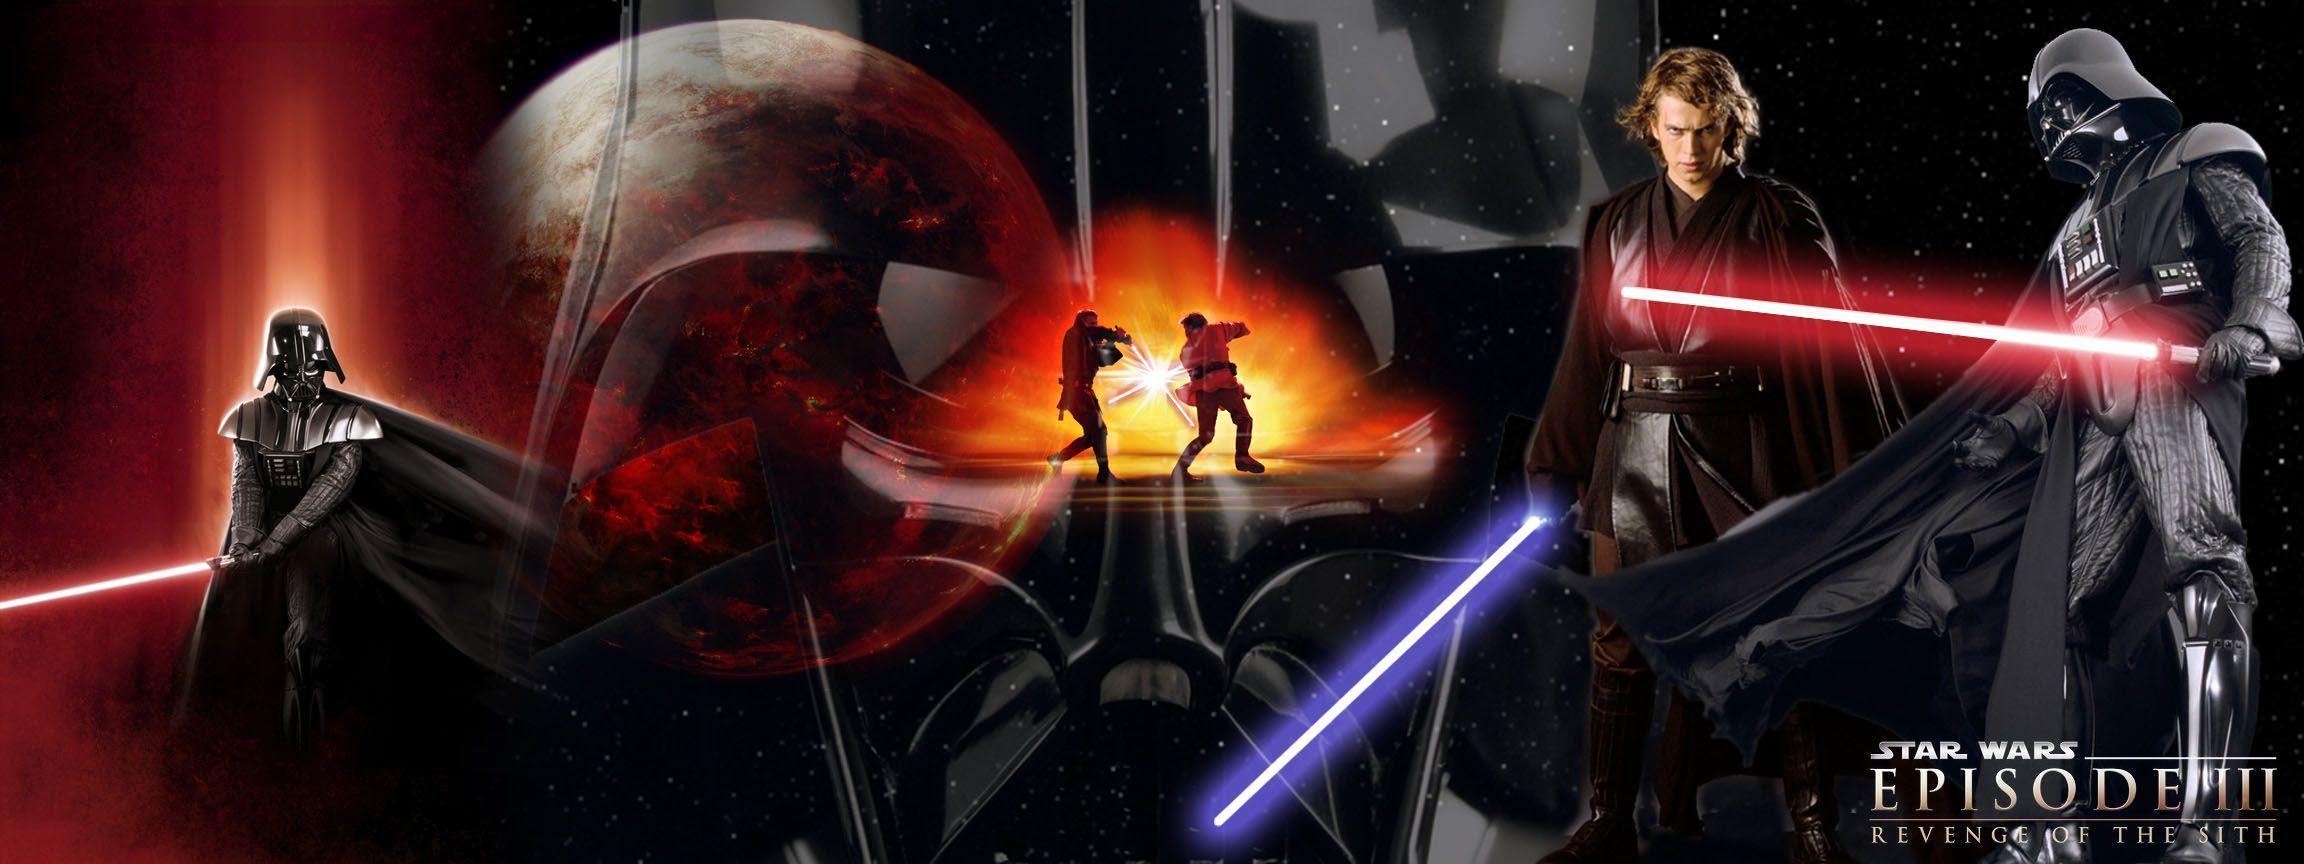 Lloyd Lemary Star Wars Dual Screen Two Screen Wallpaper Star Wars 2304x864 Wallpaper Teahub Io